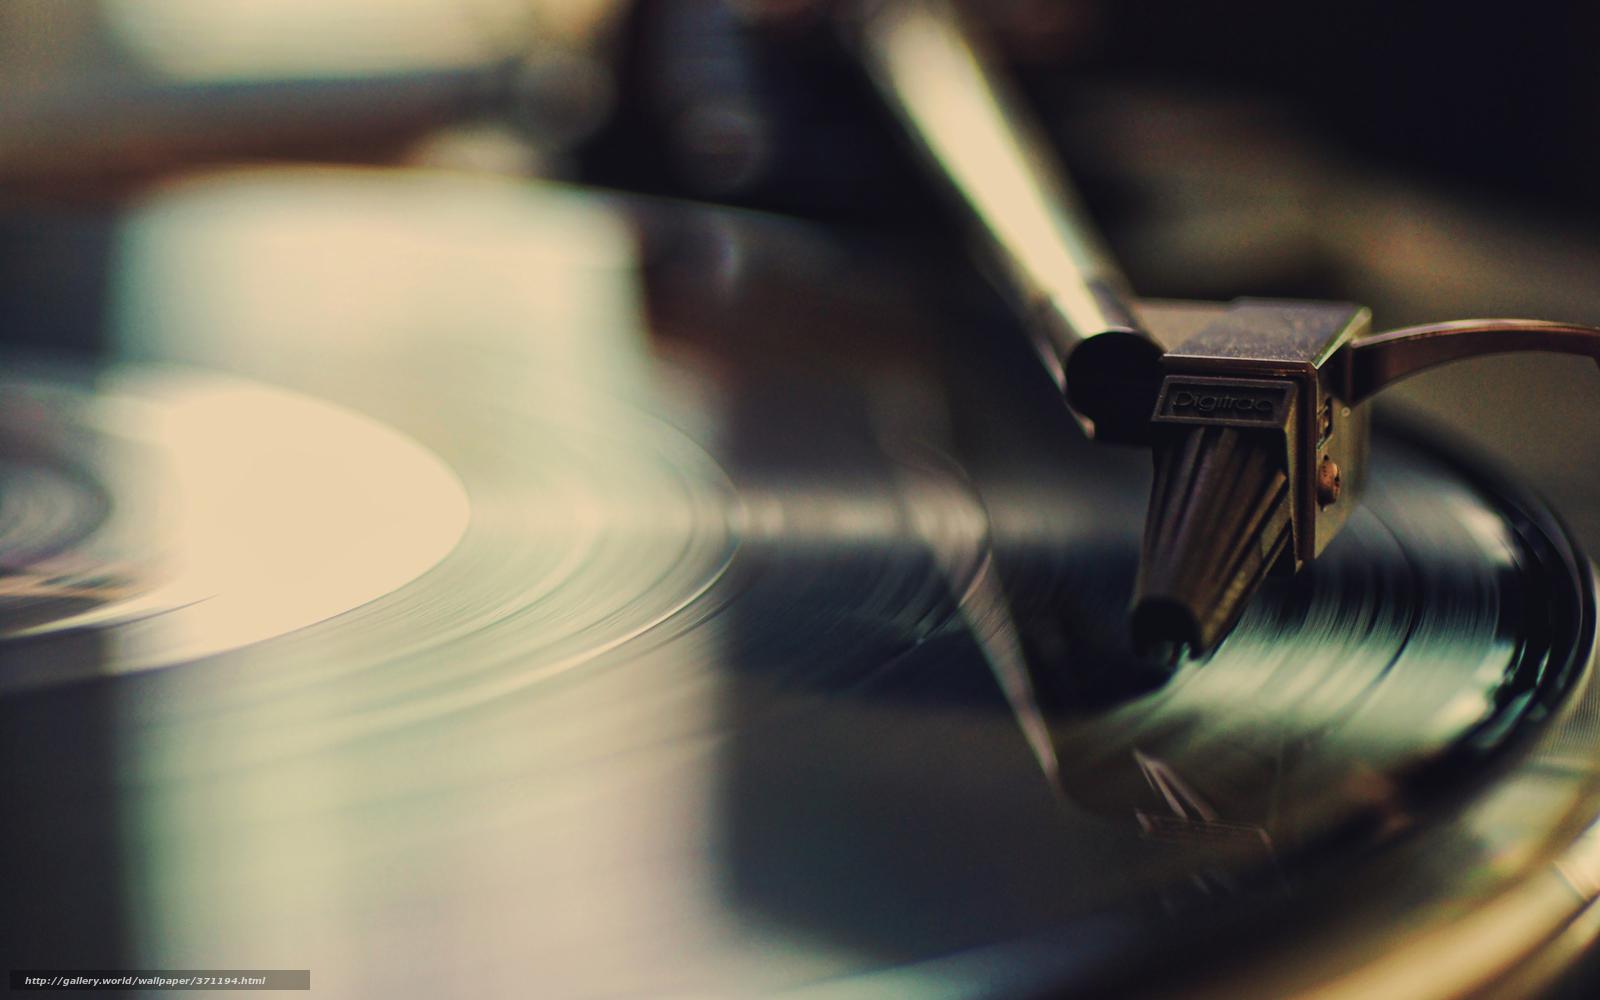 Download wallpaper record music Player retro desktop wallpaper 1600x1000